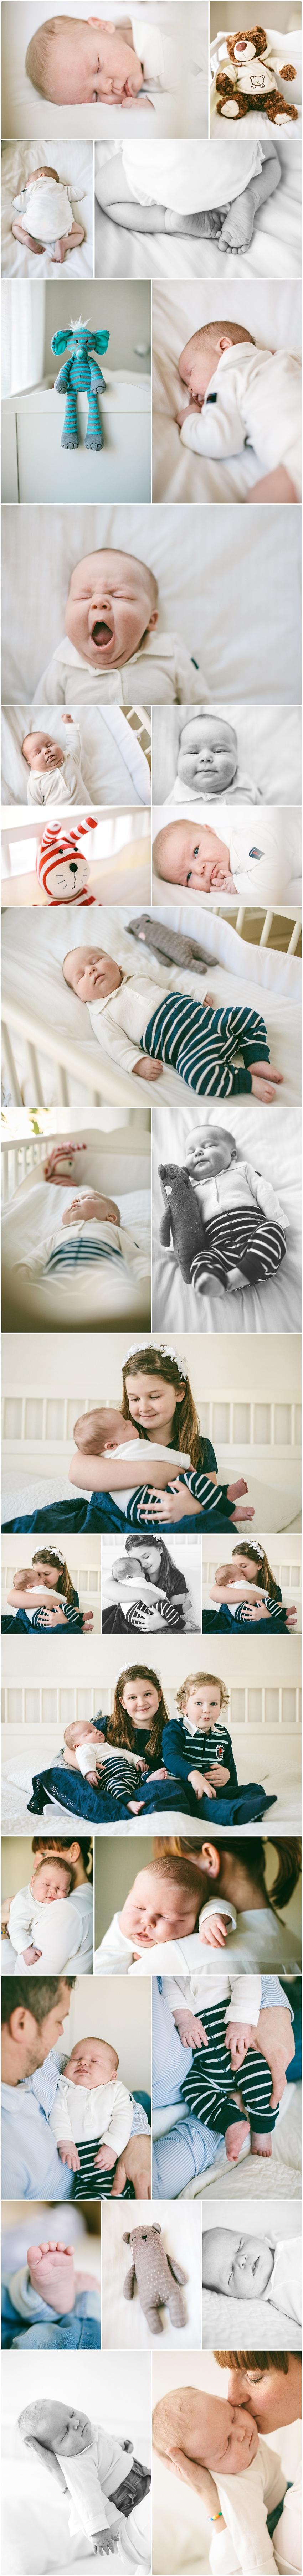 alve_newborn